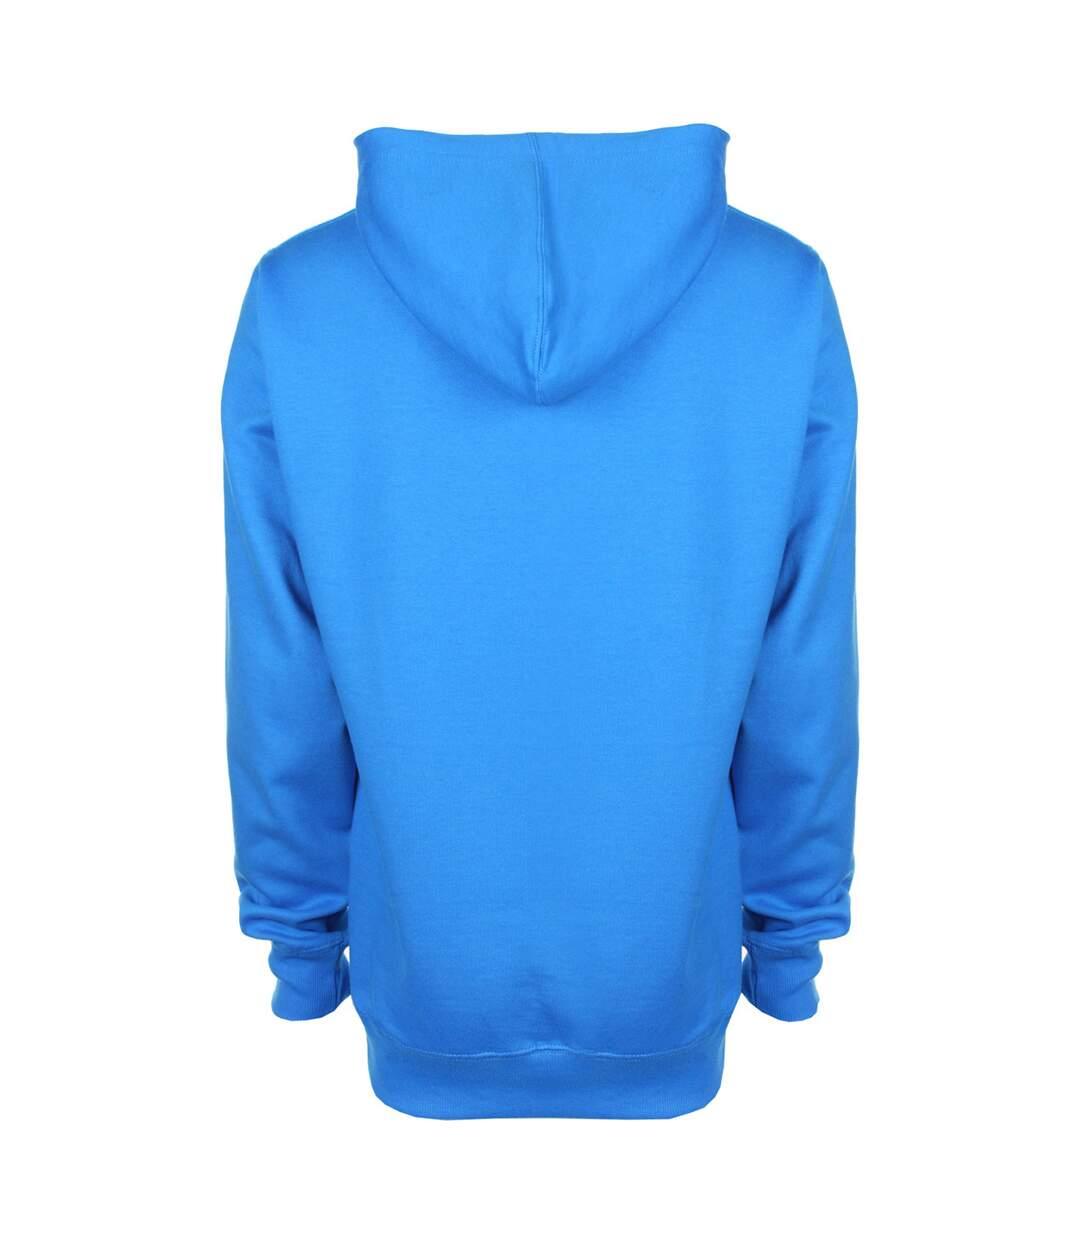 FDM Unisex Contrast Hooded Sweatshirt / Hoodie (300 GSM) (Sapphire/ Heather Grey) - UTBC2025